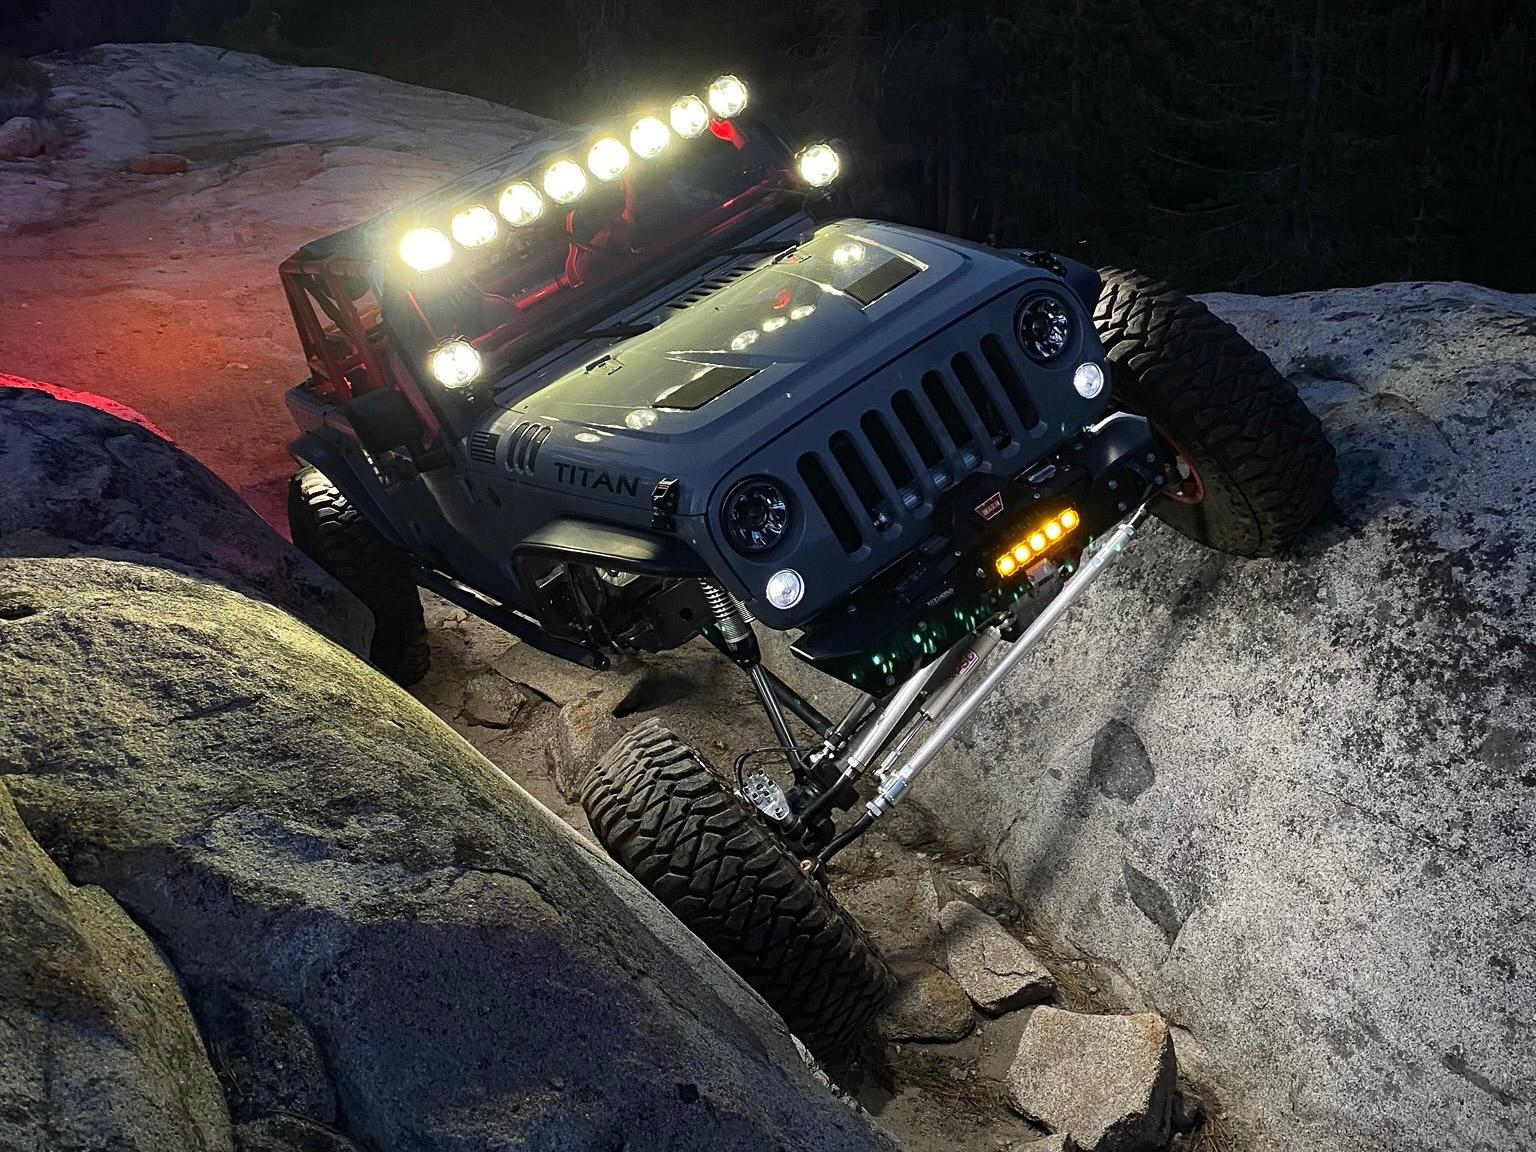 Custom Jeep JK Rock Crawling at Night